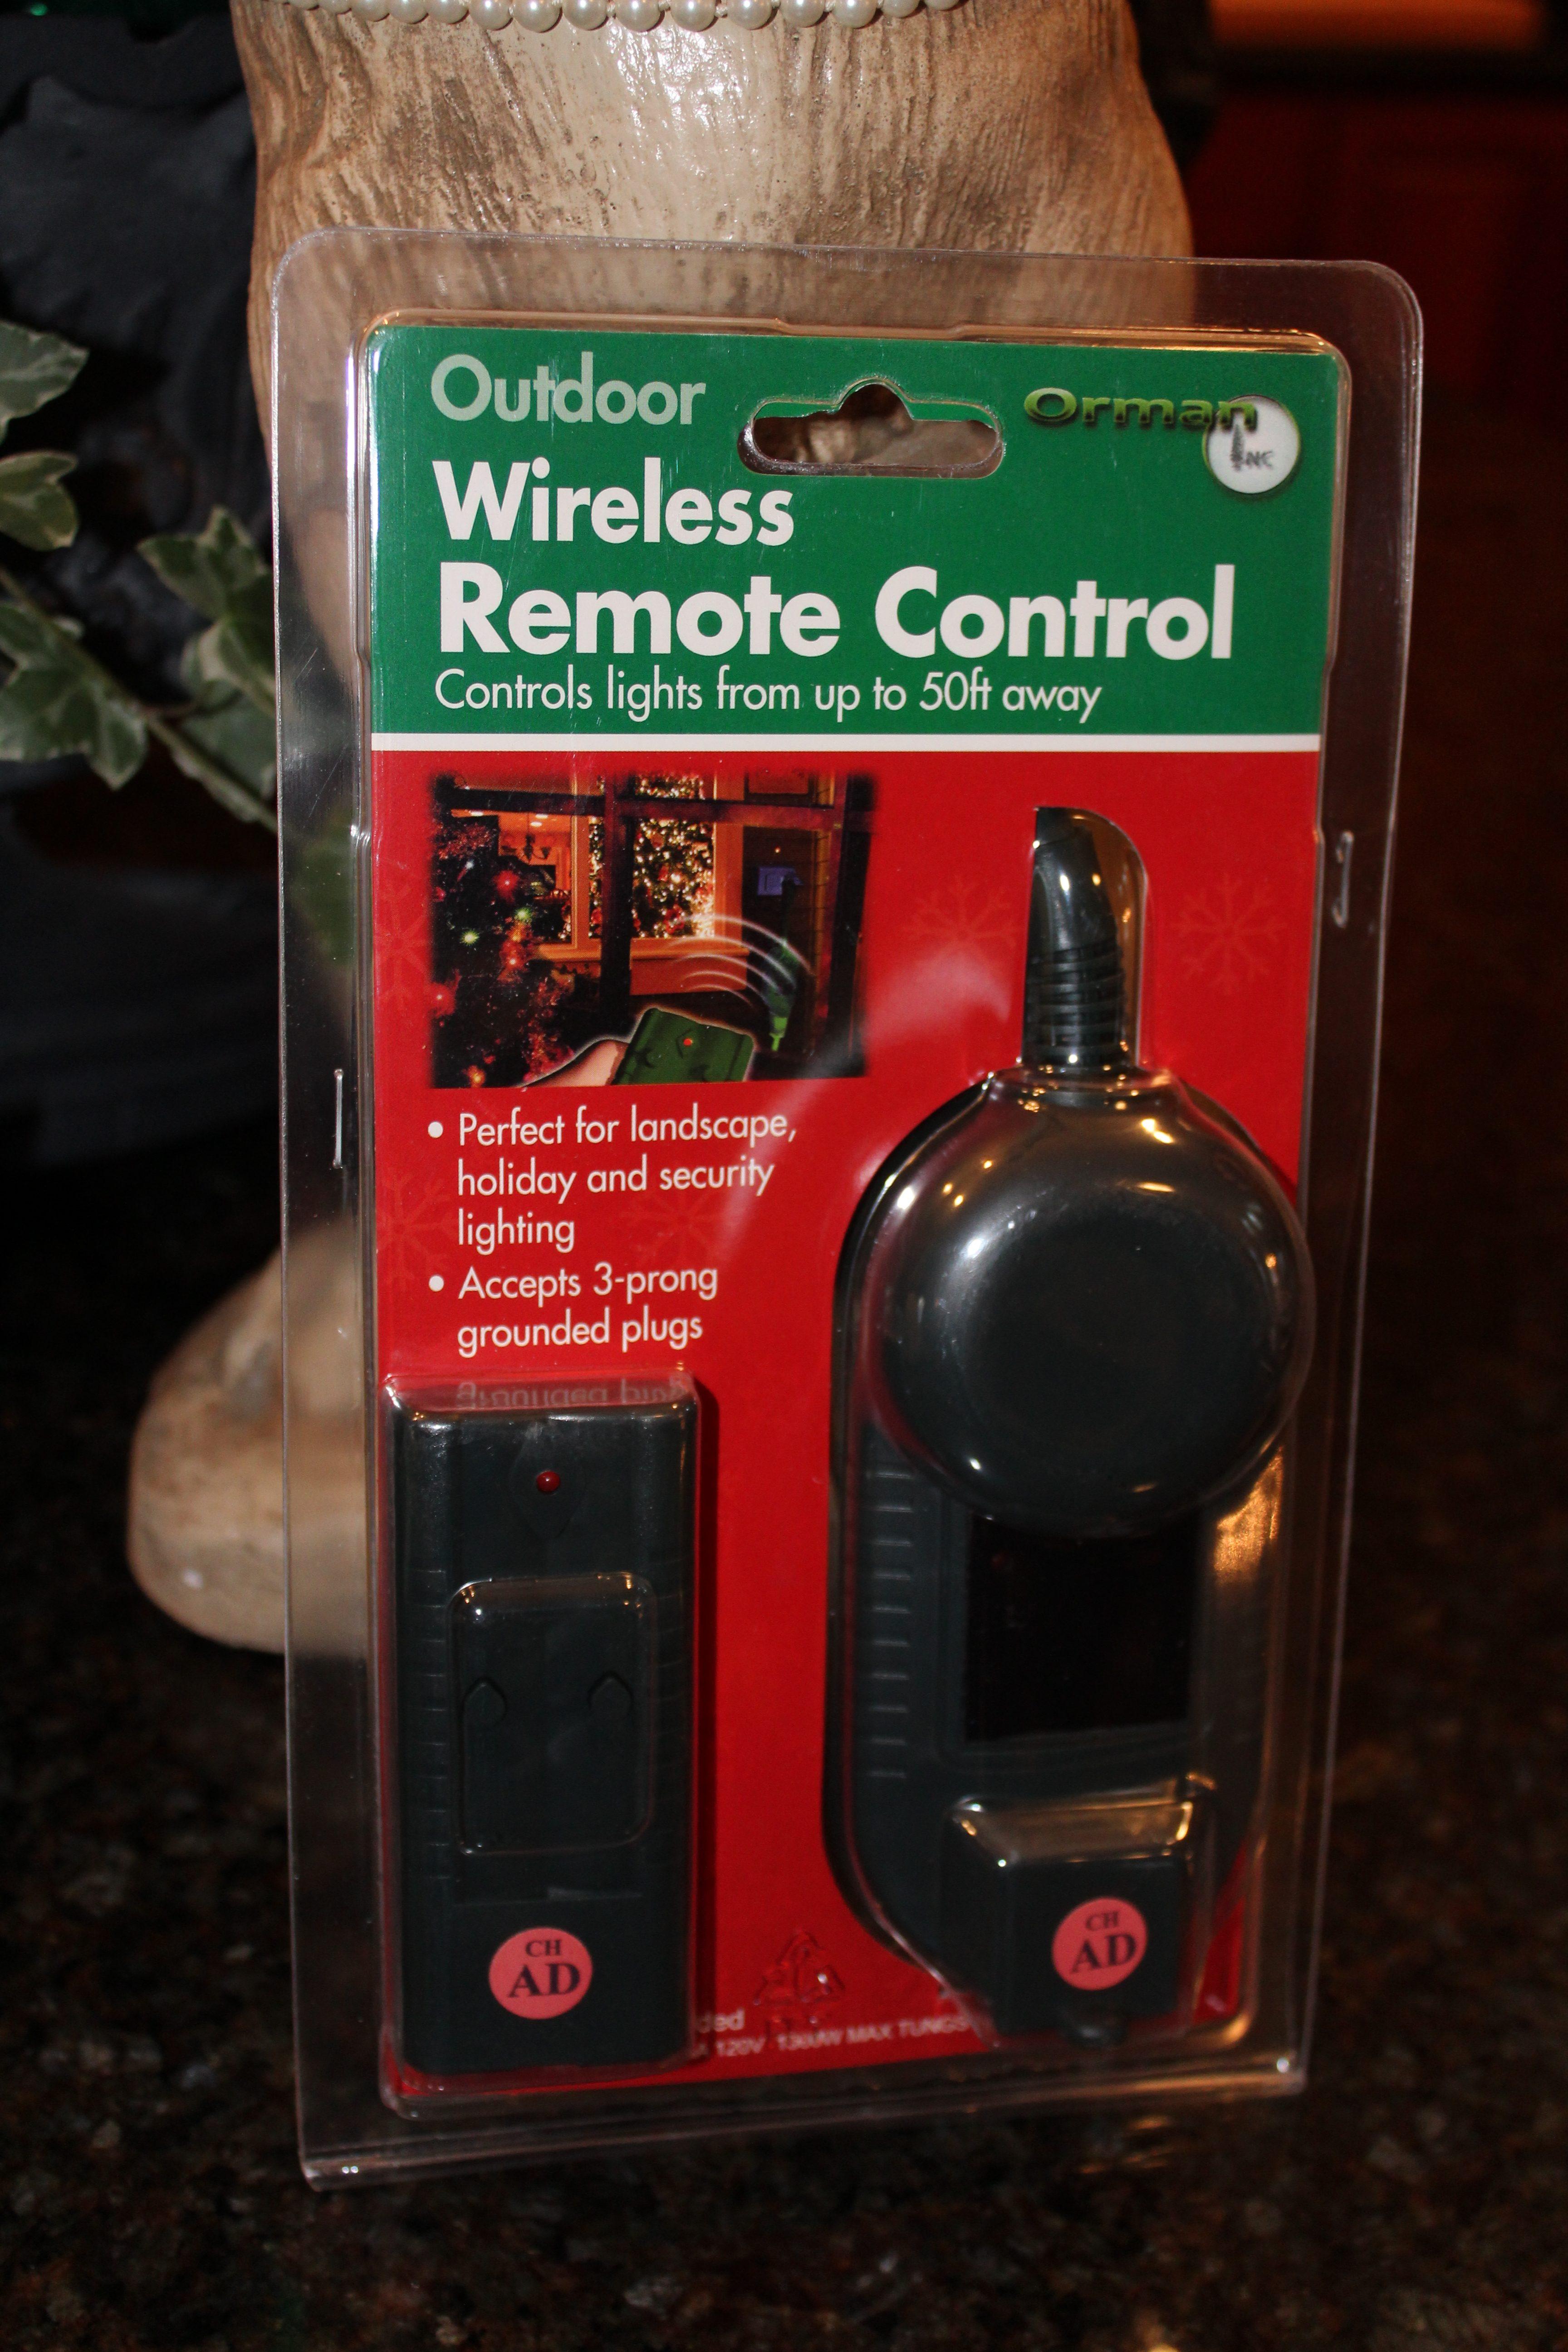 Outdoor Wireless Remote Control Dells Daily Dish